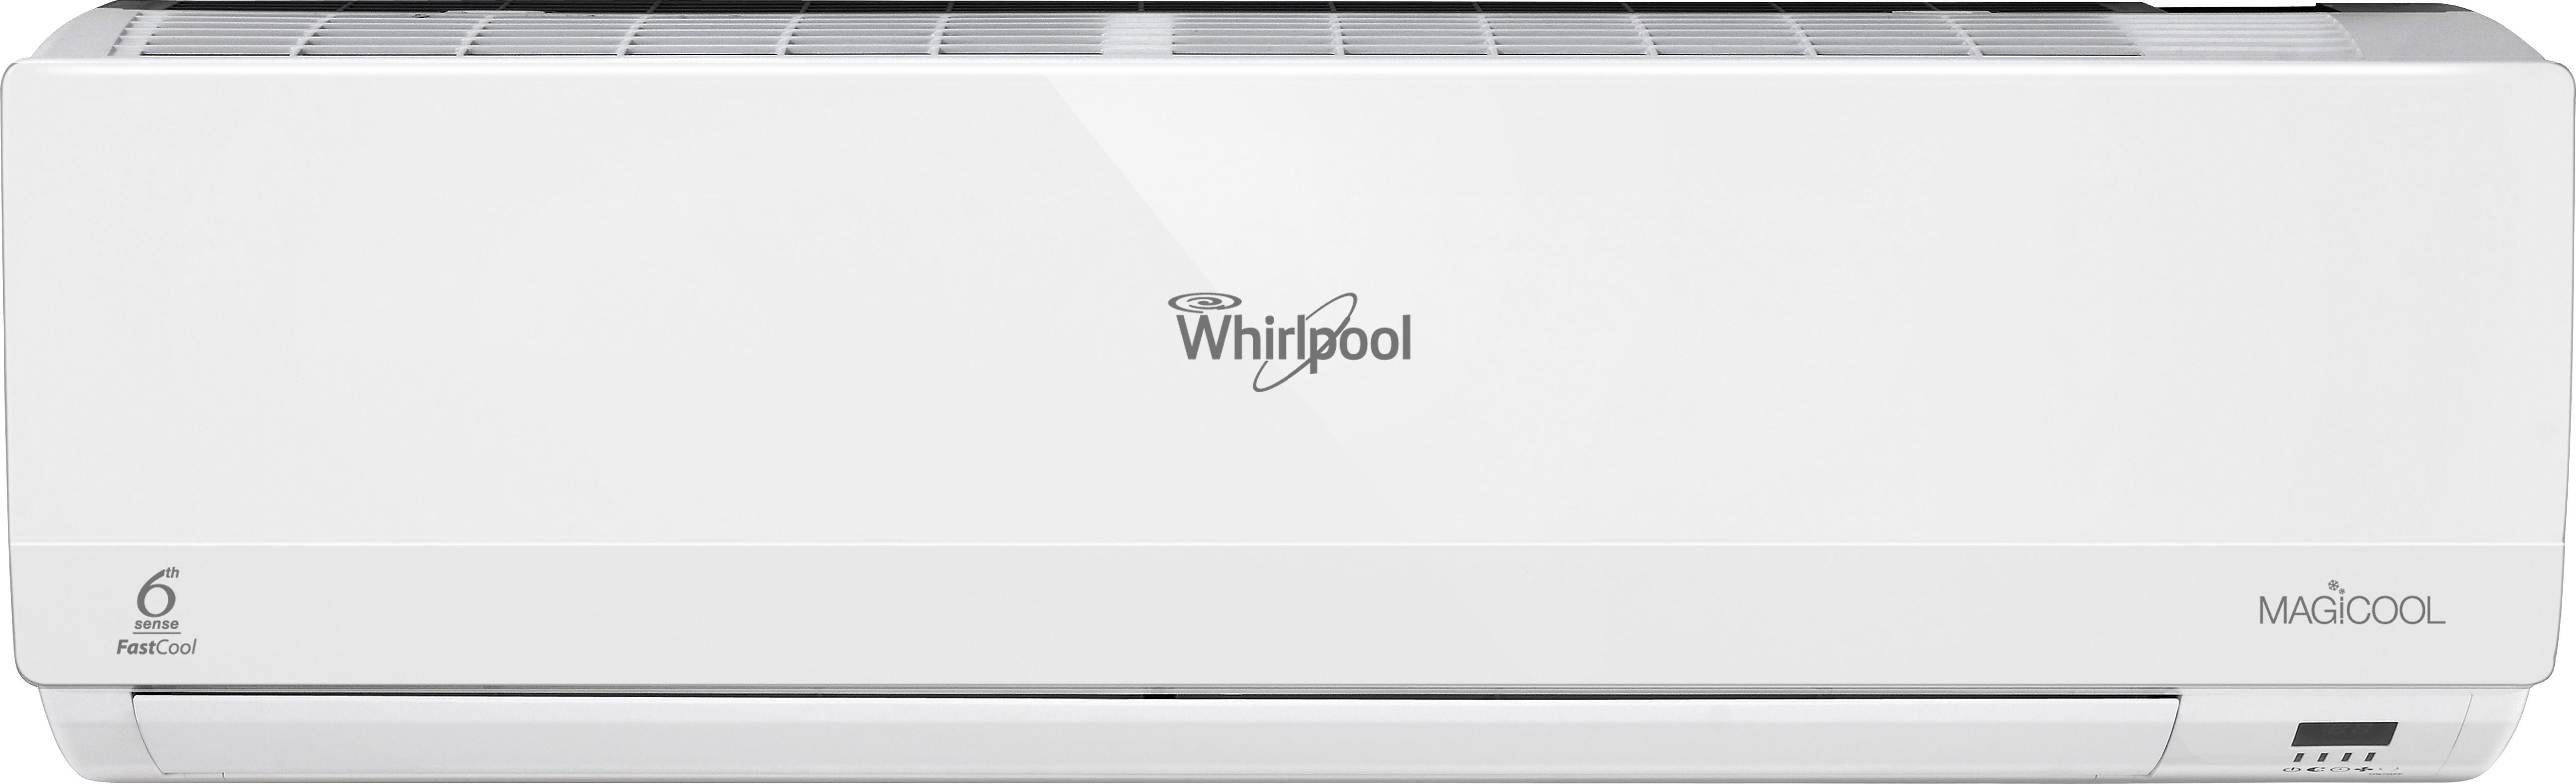 View Whirlpool 1.5 Tons 3 Star Split AC White  Price Online